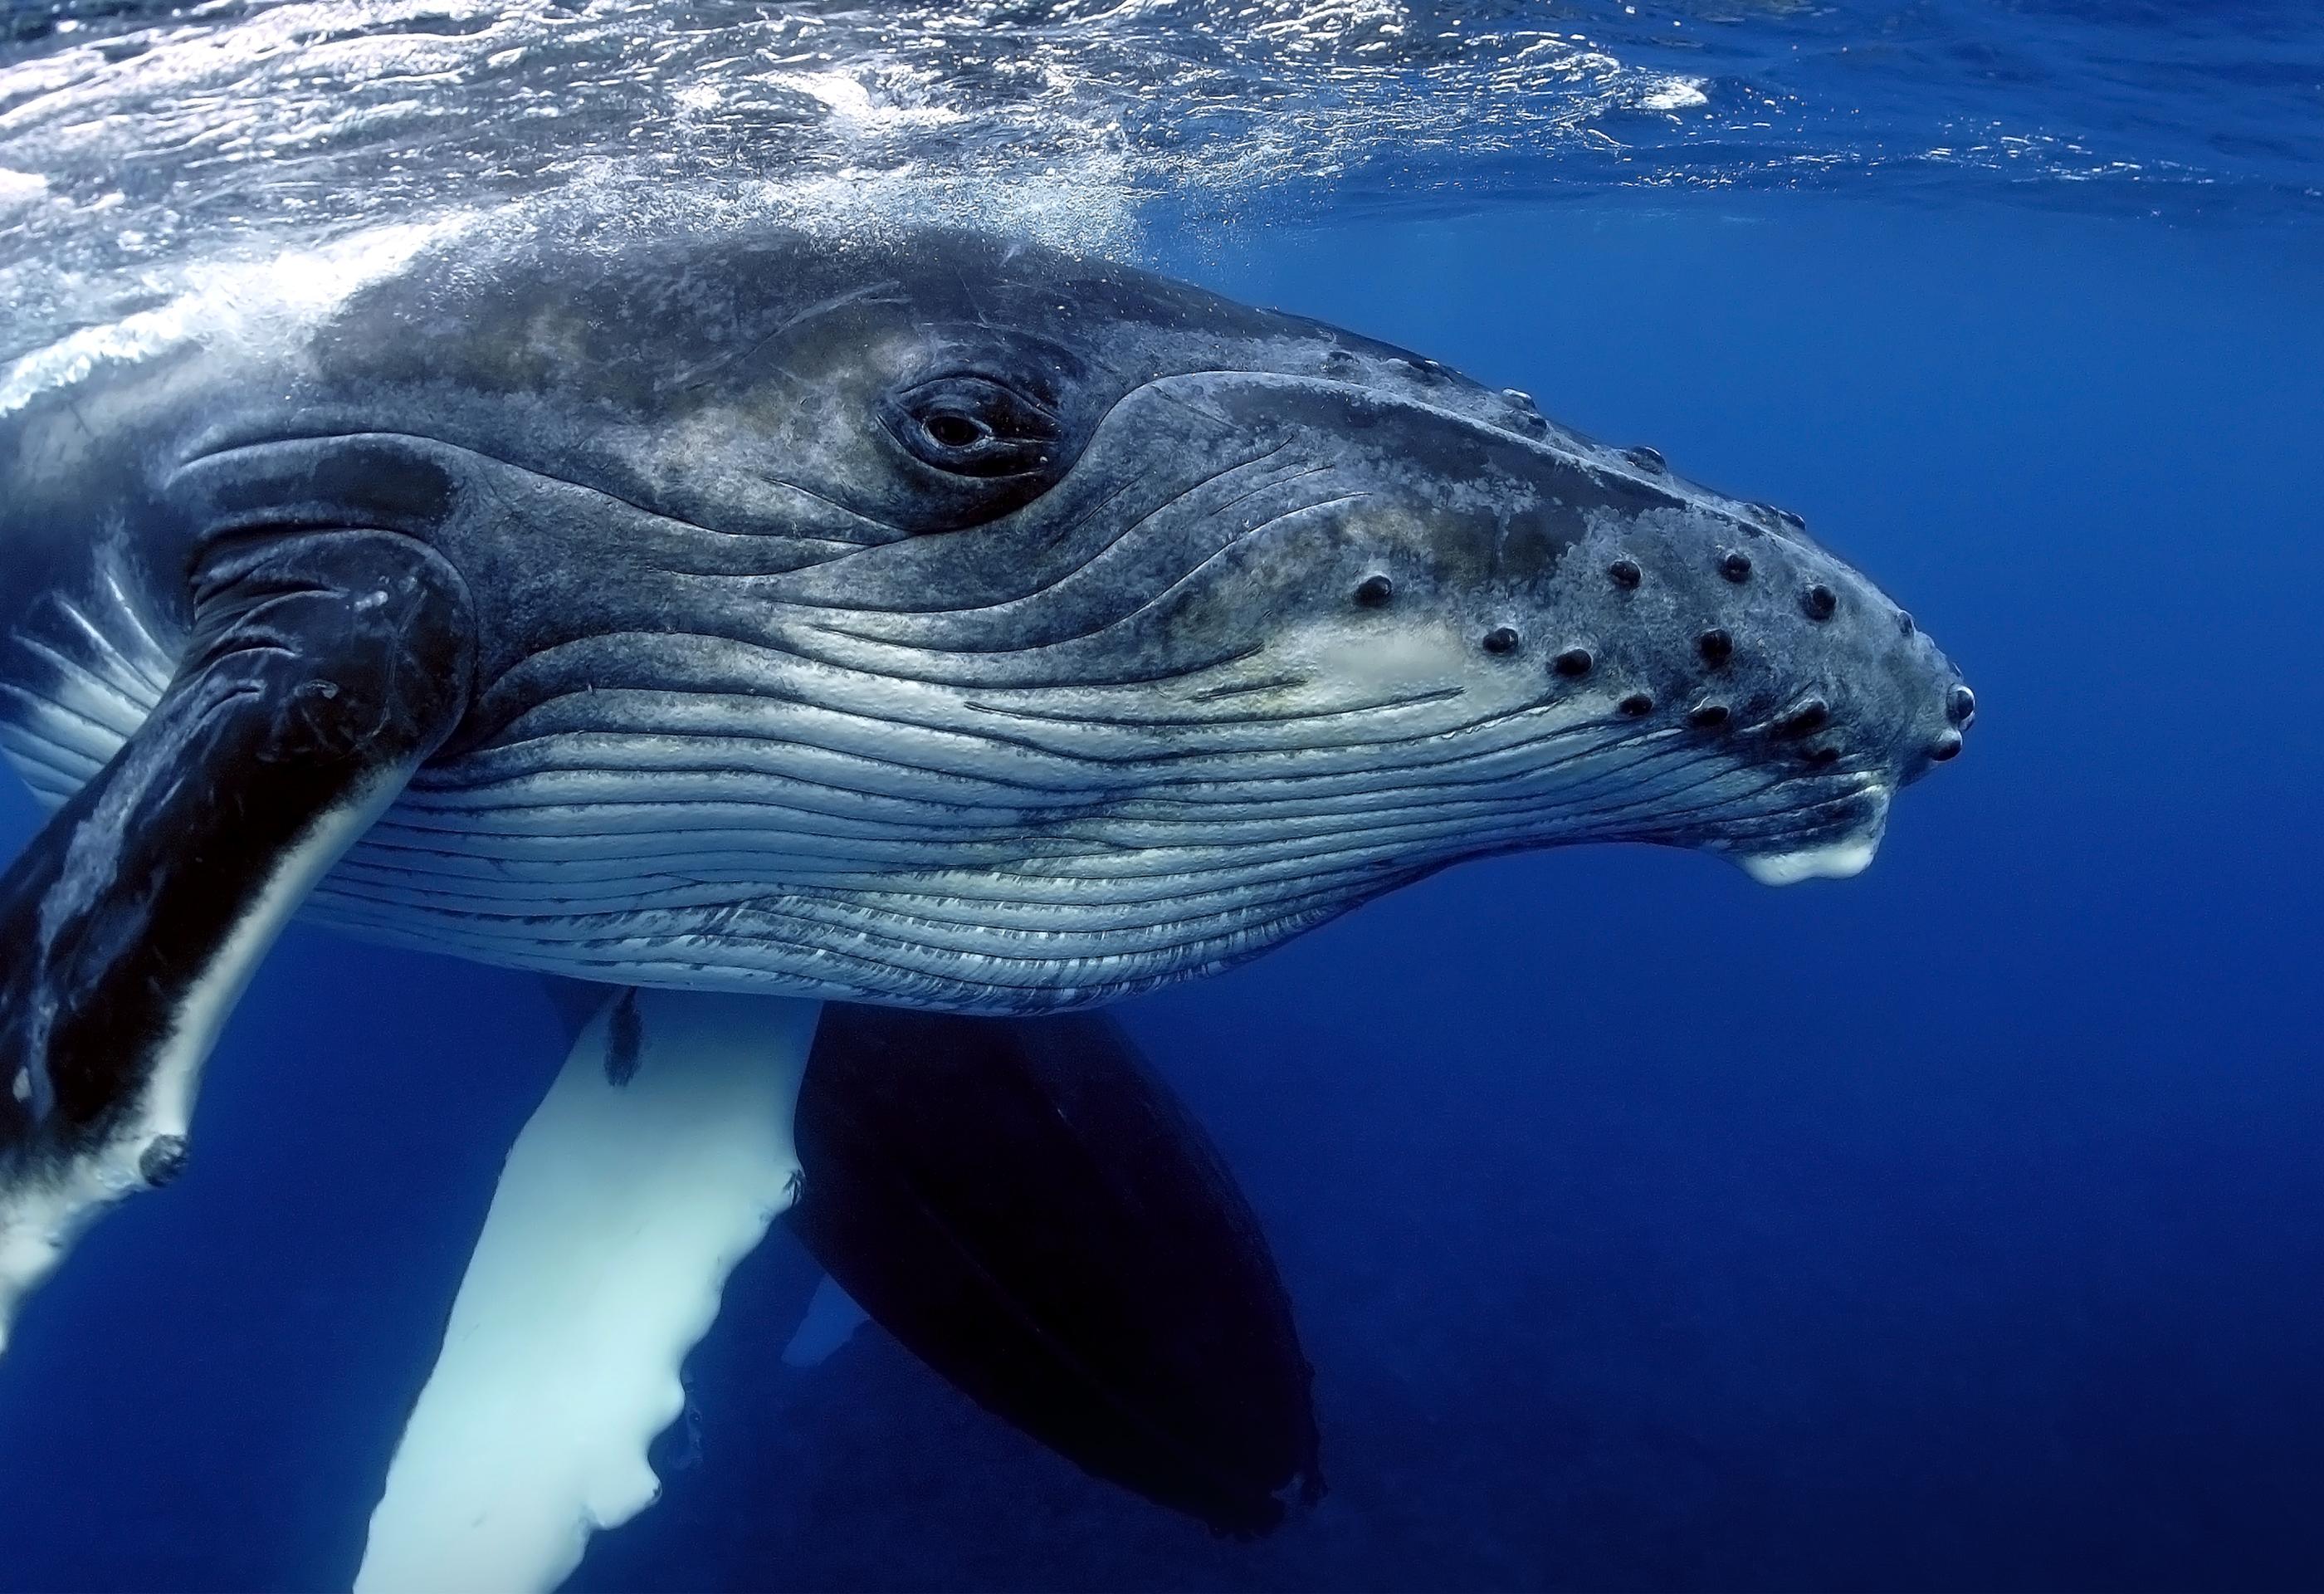 Ballena en el agua (Shutterstock)